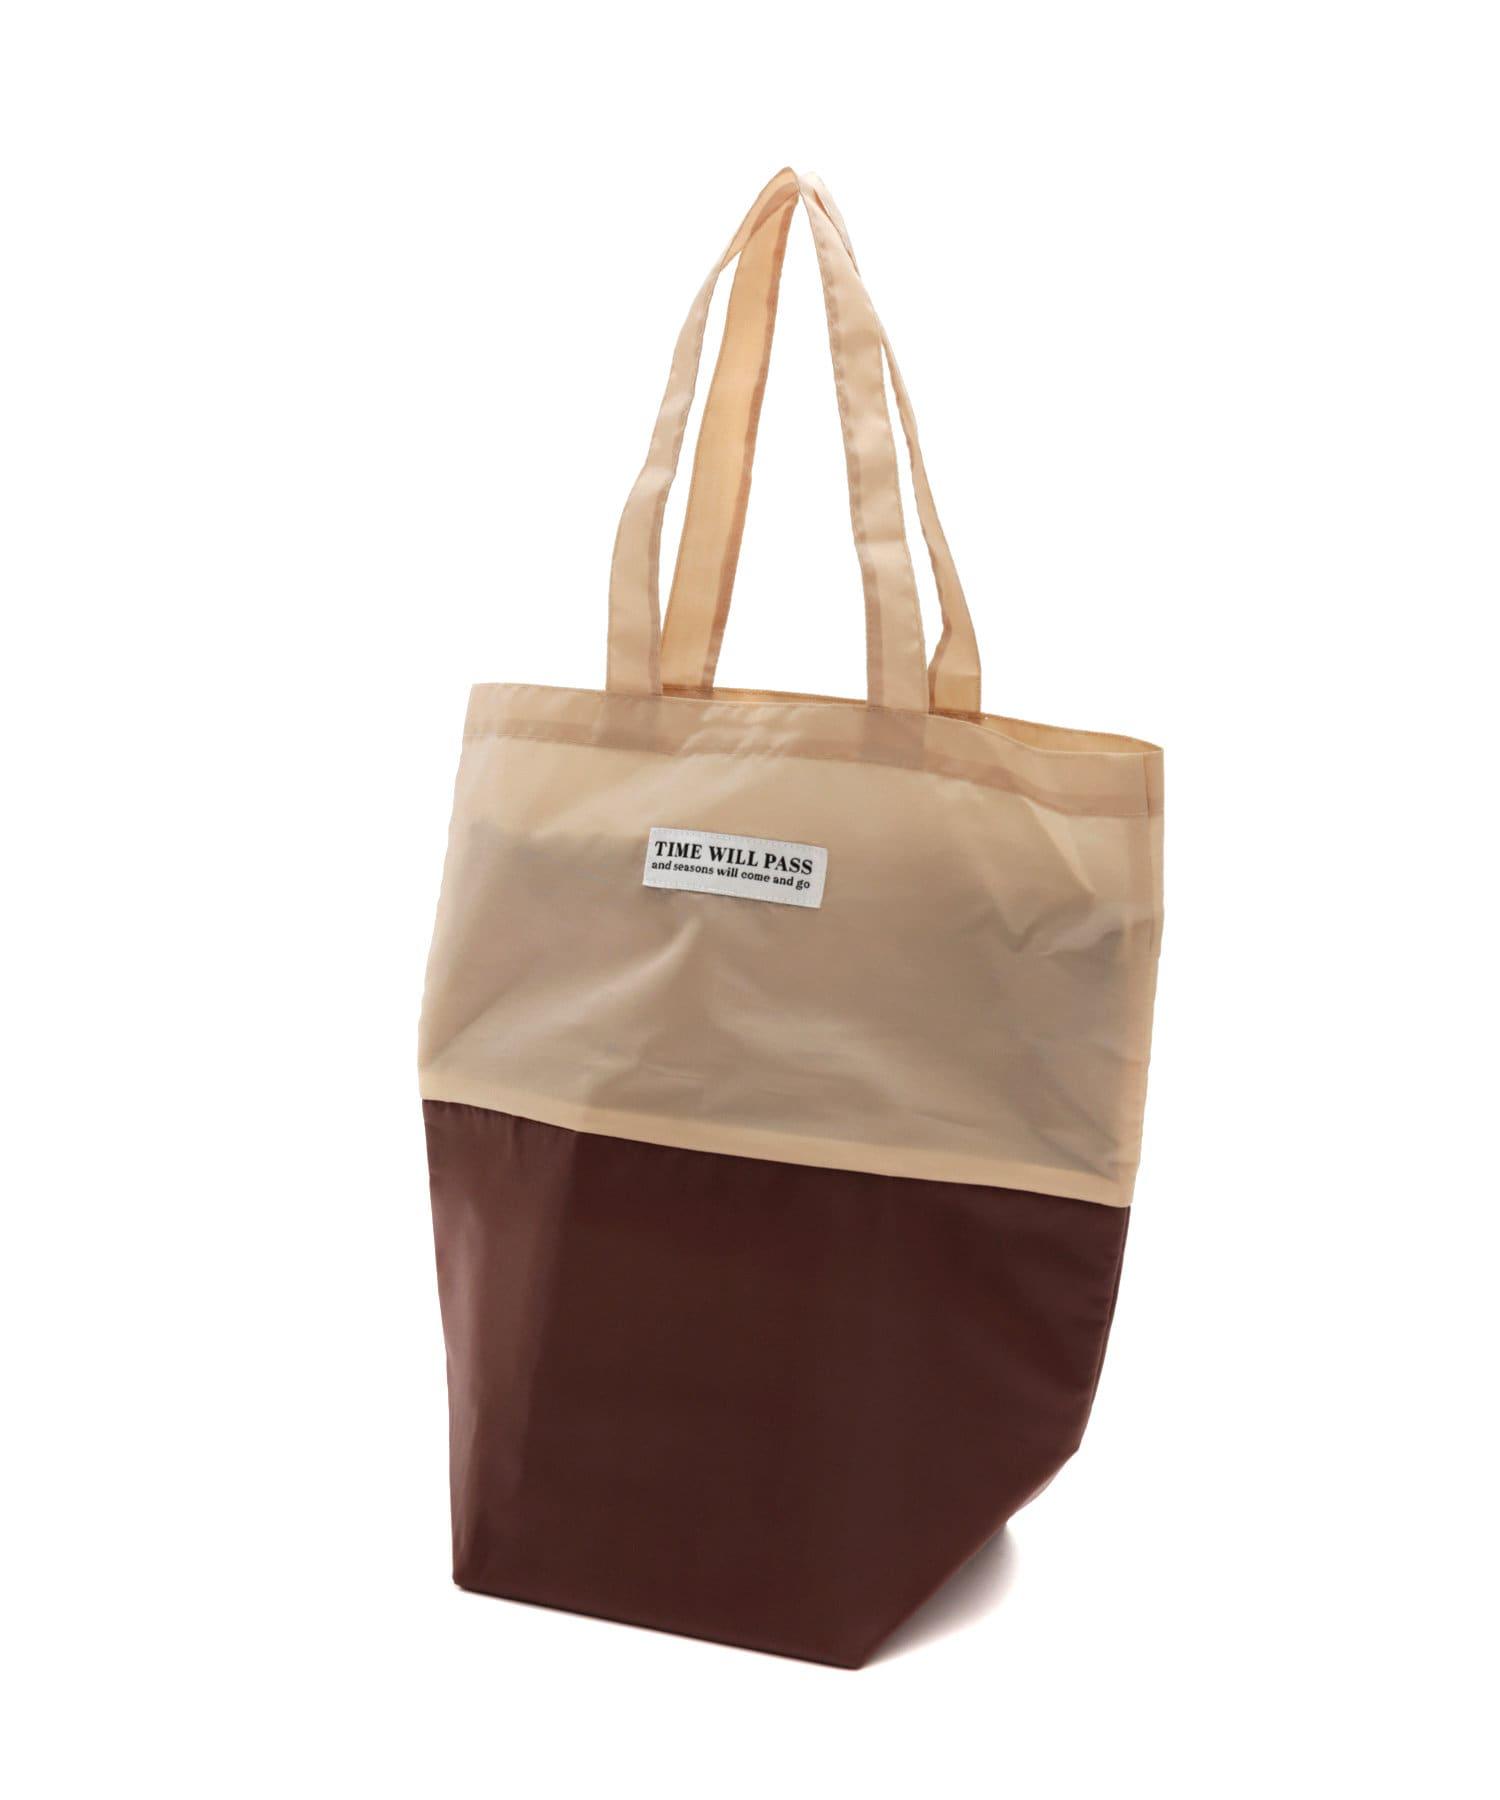 3COINS(スリーコインズ) ライフスタイル 【目的に合わせて機能いろいろ】2段バッグ:底アルミ付き ベージュ